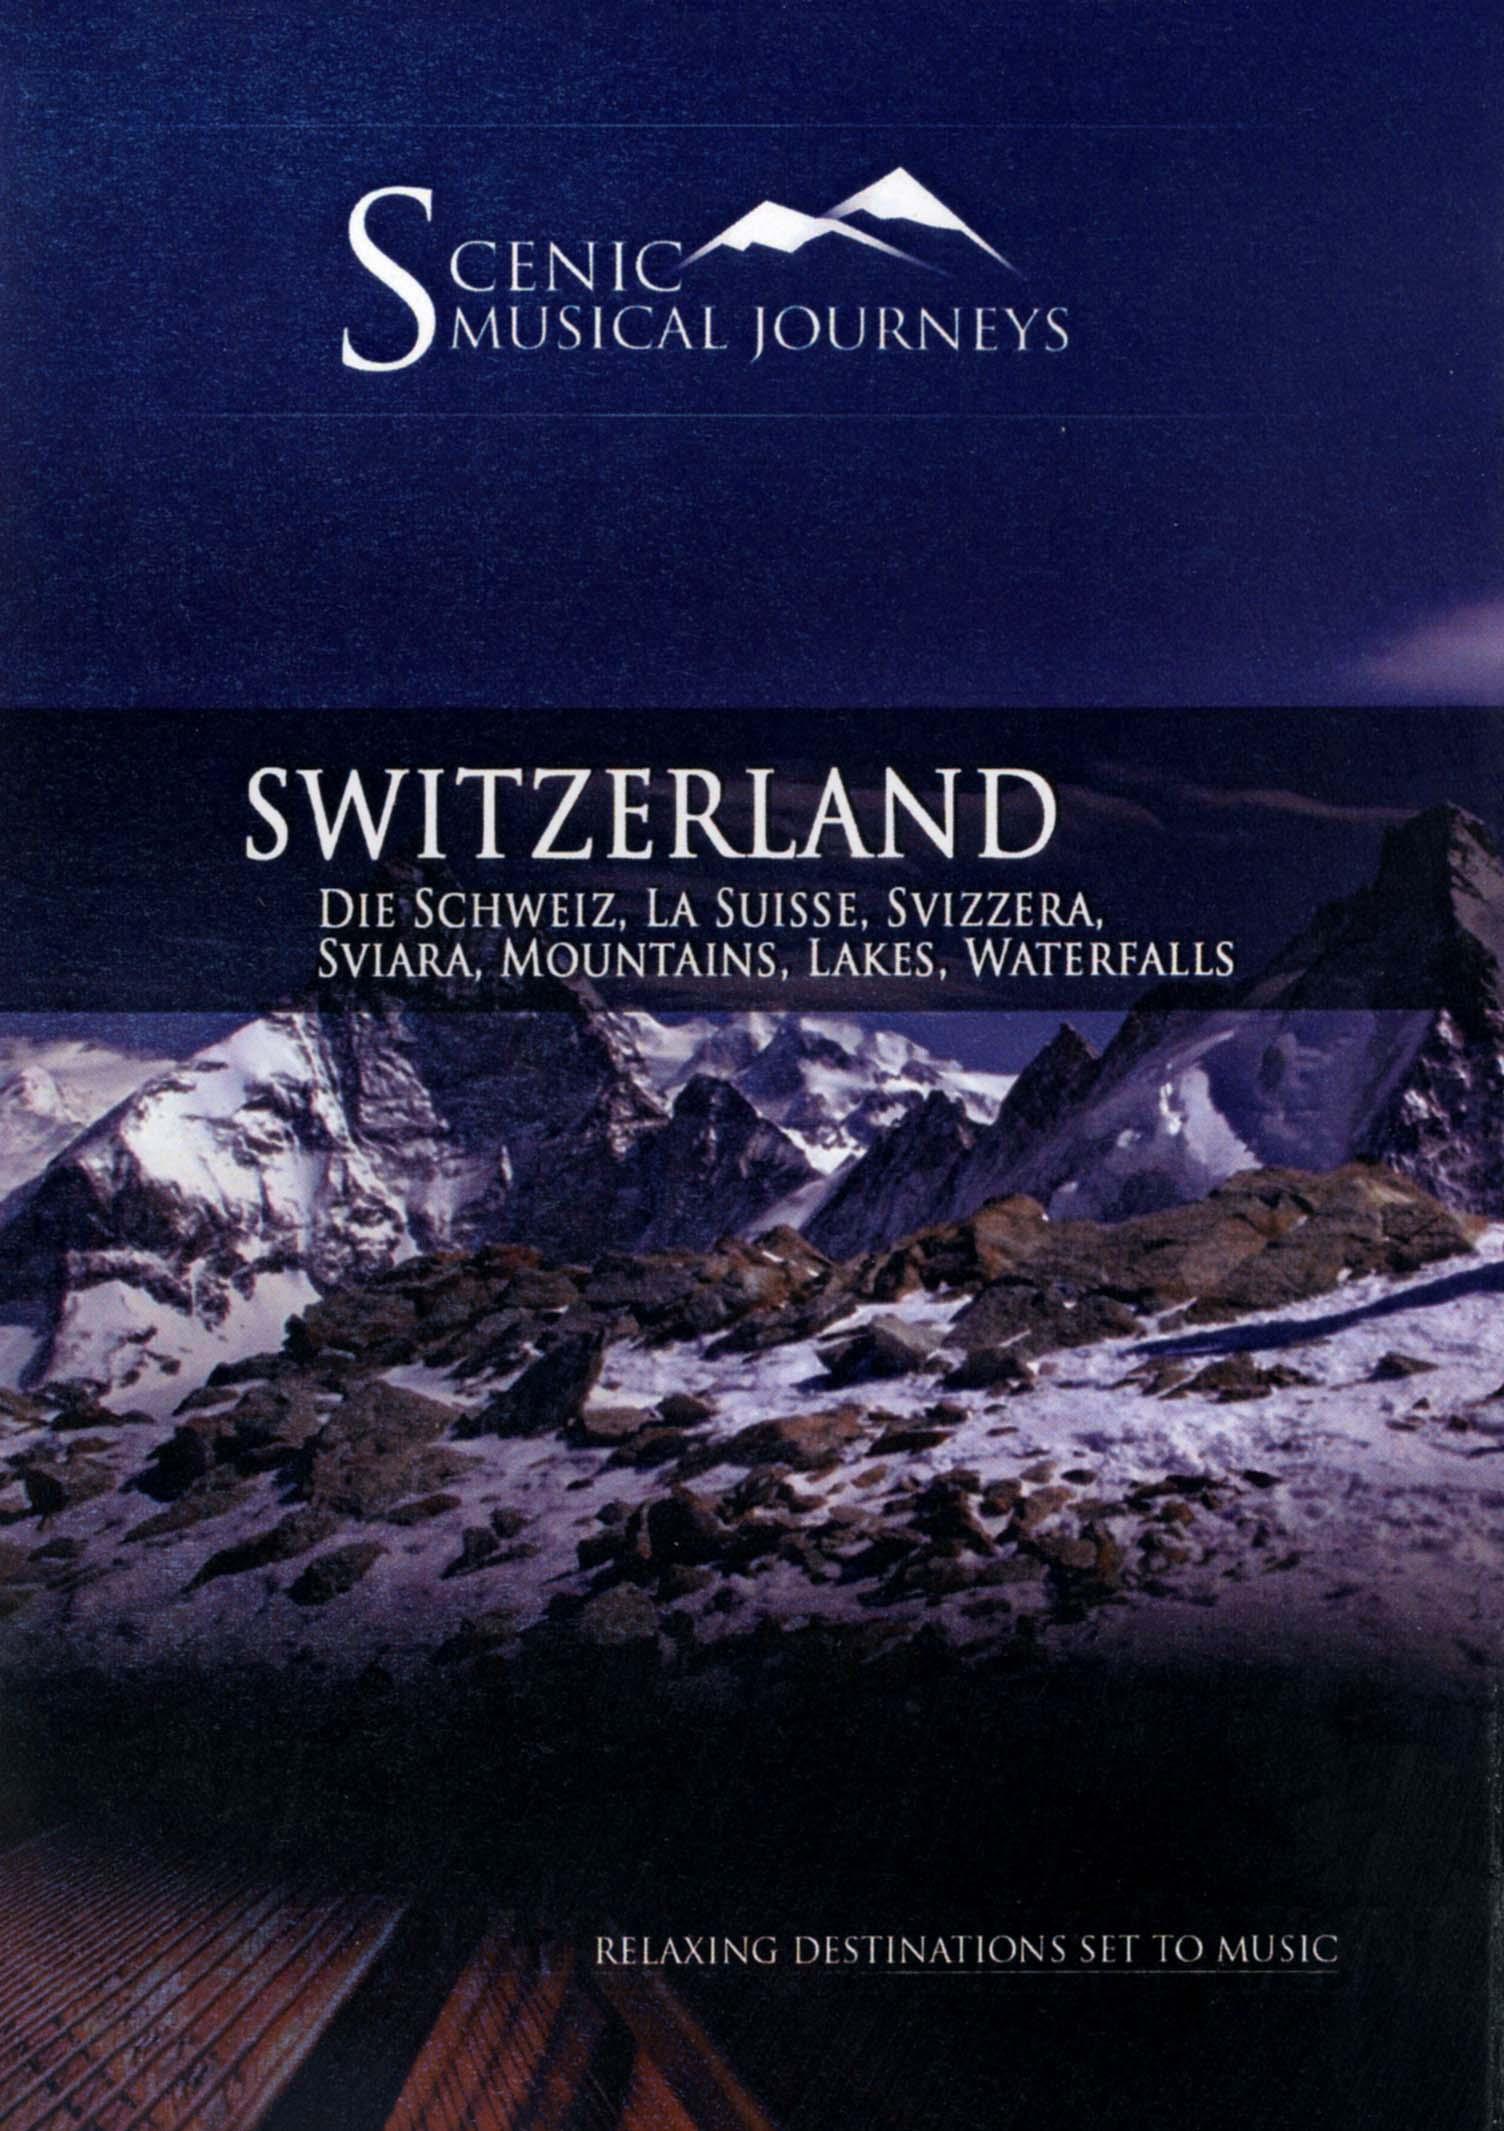 Scenic Musical Journeys: Switzerland - Die Schweiz, La Suisse, Svizzera, Sviara, Mountains, Lakes